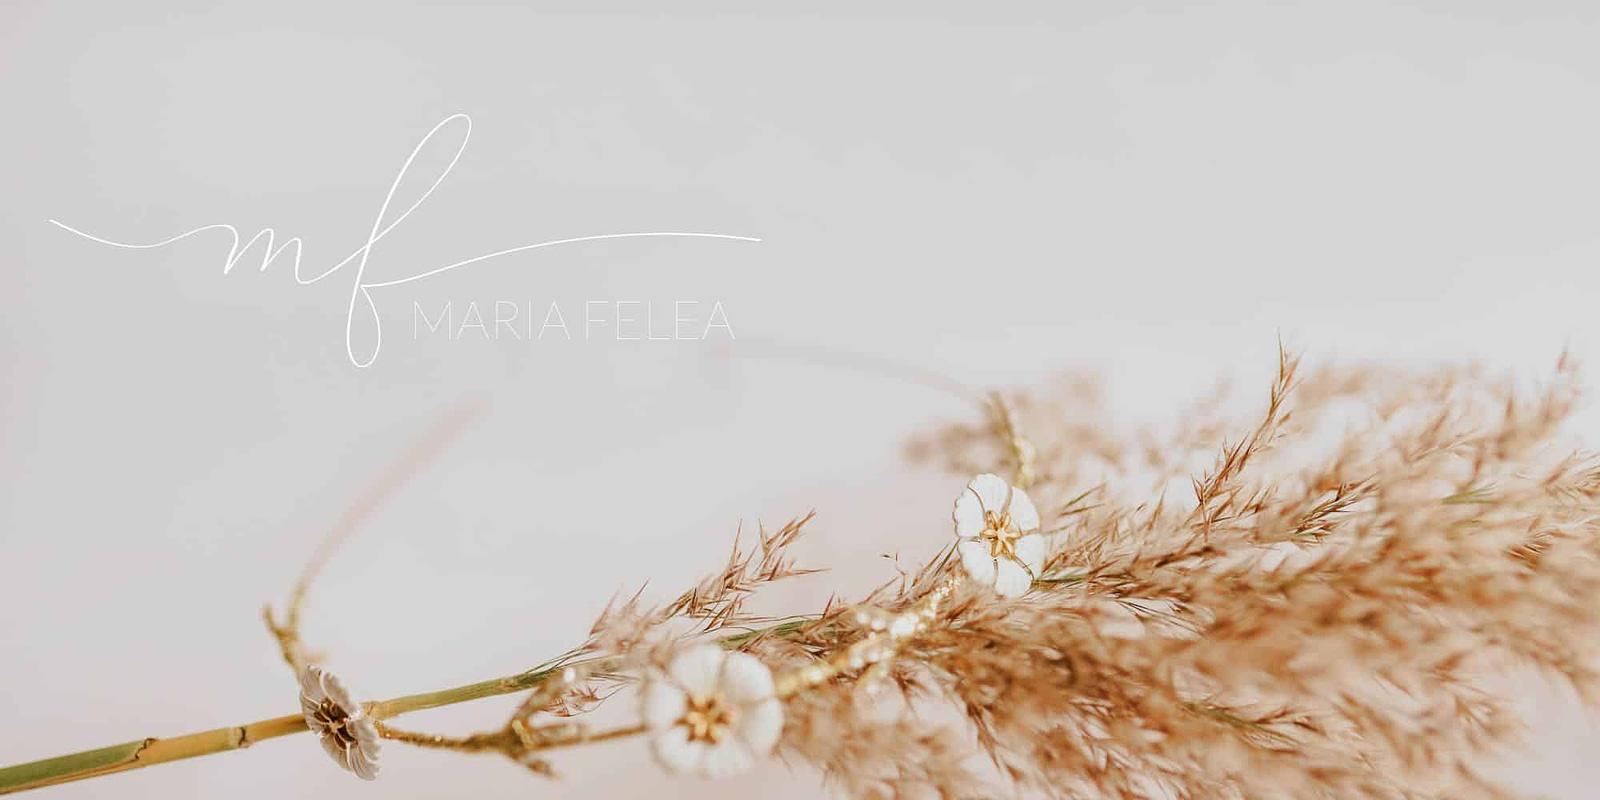 Maria Felea, style guide, identitate vizuala, branding, brand, logo, logo design